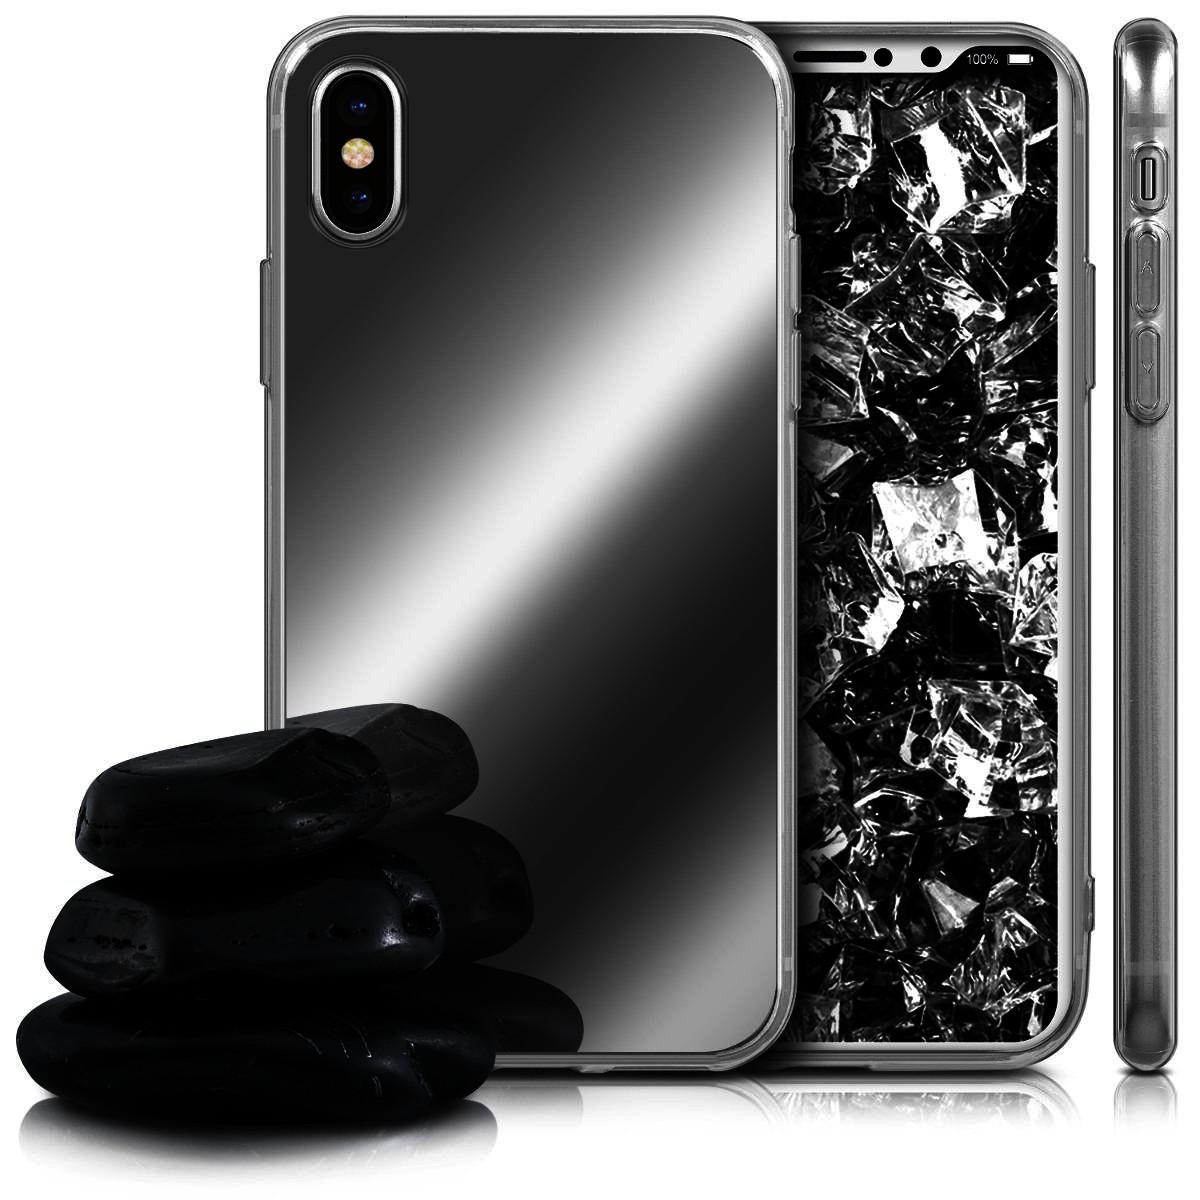 Pouzdro Telekryty Zrcadlové mirror iPhone X černé